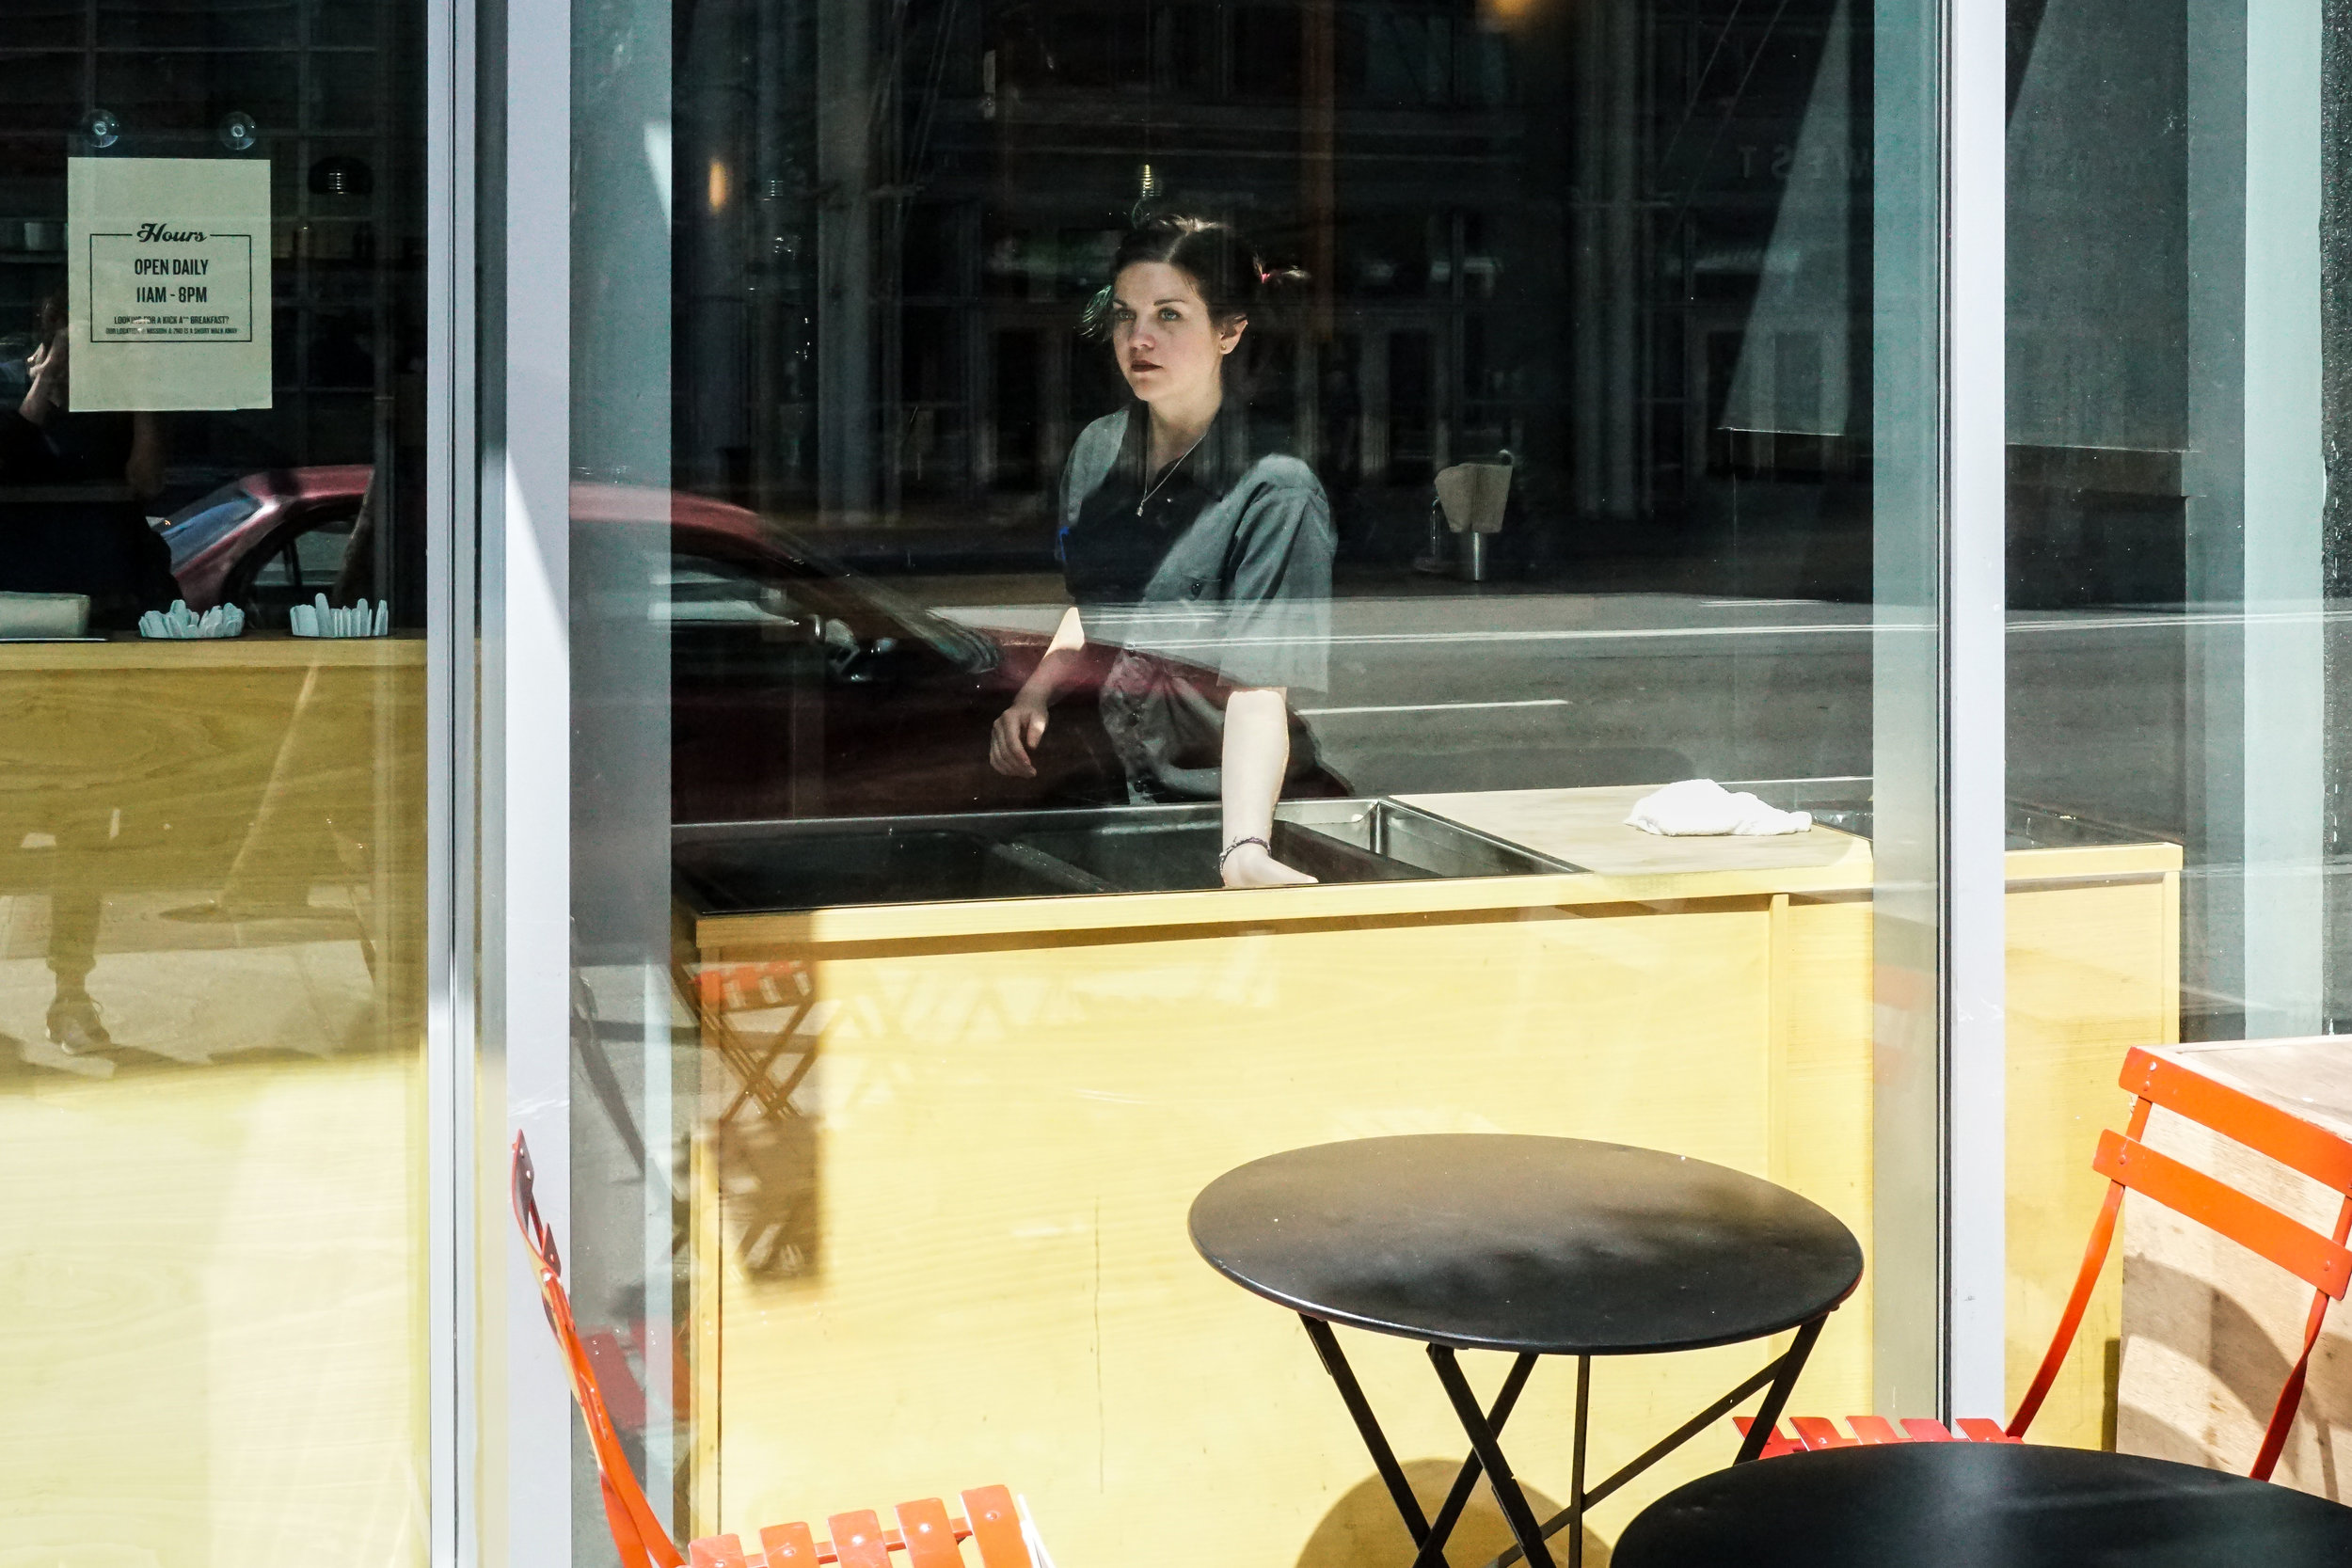 Waitress-1-01928.jpg